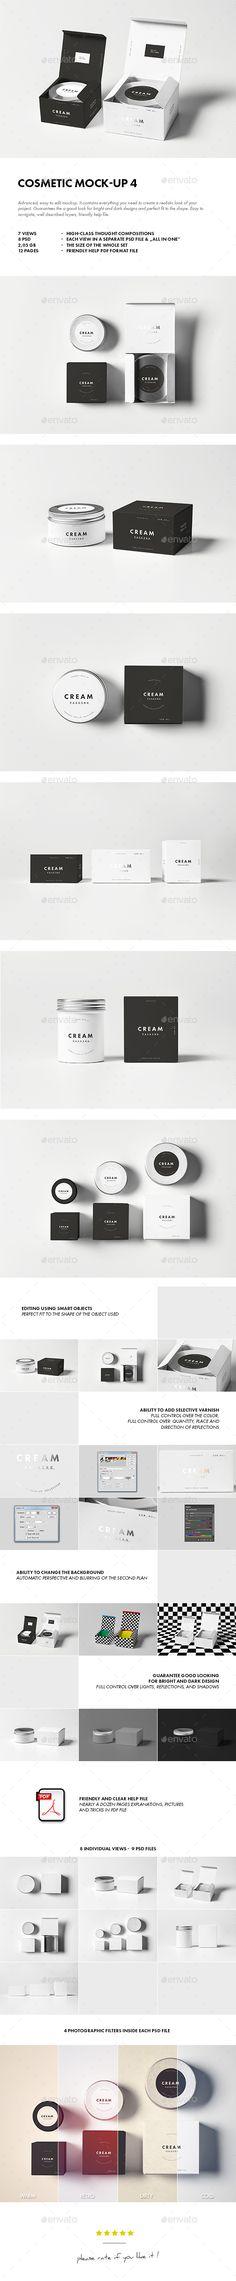 Cosmetic Mock-up #design Download: http://graphicriver.net/item/cosmetic-mockup-4/12021440?ref=ksioks